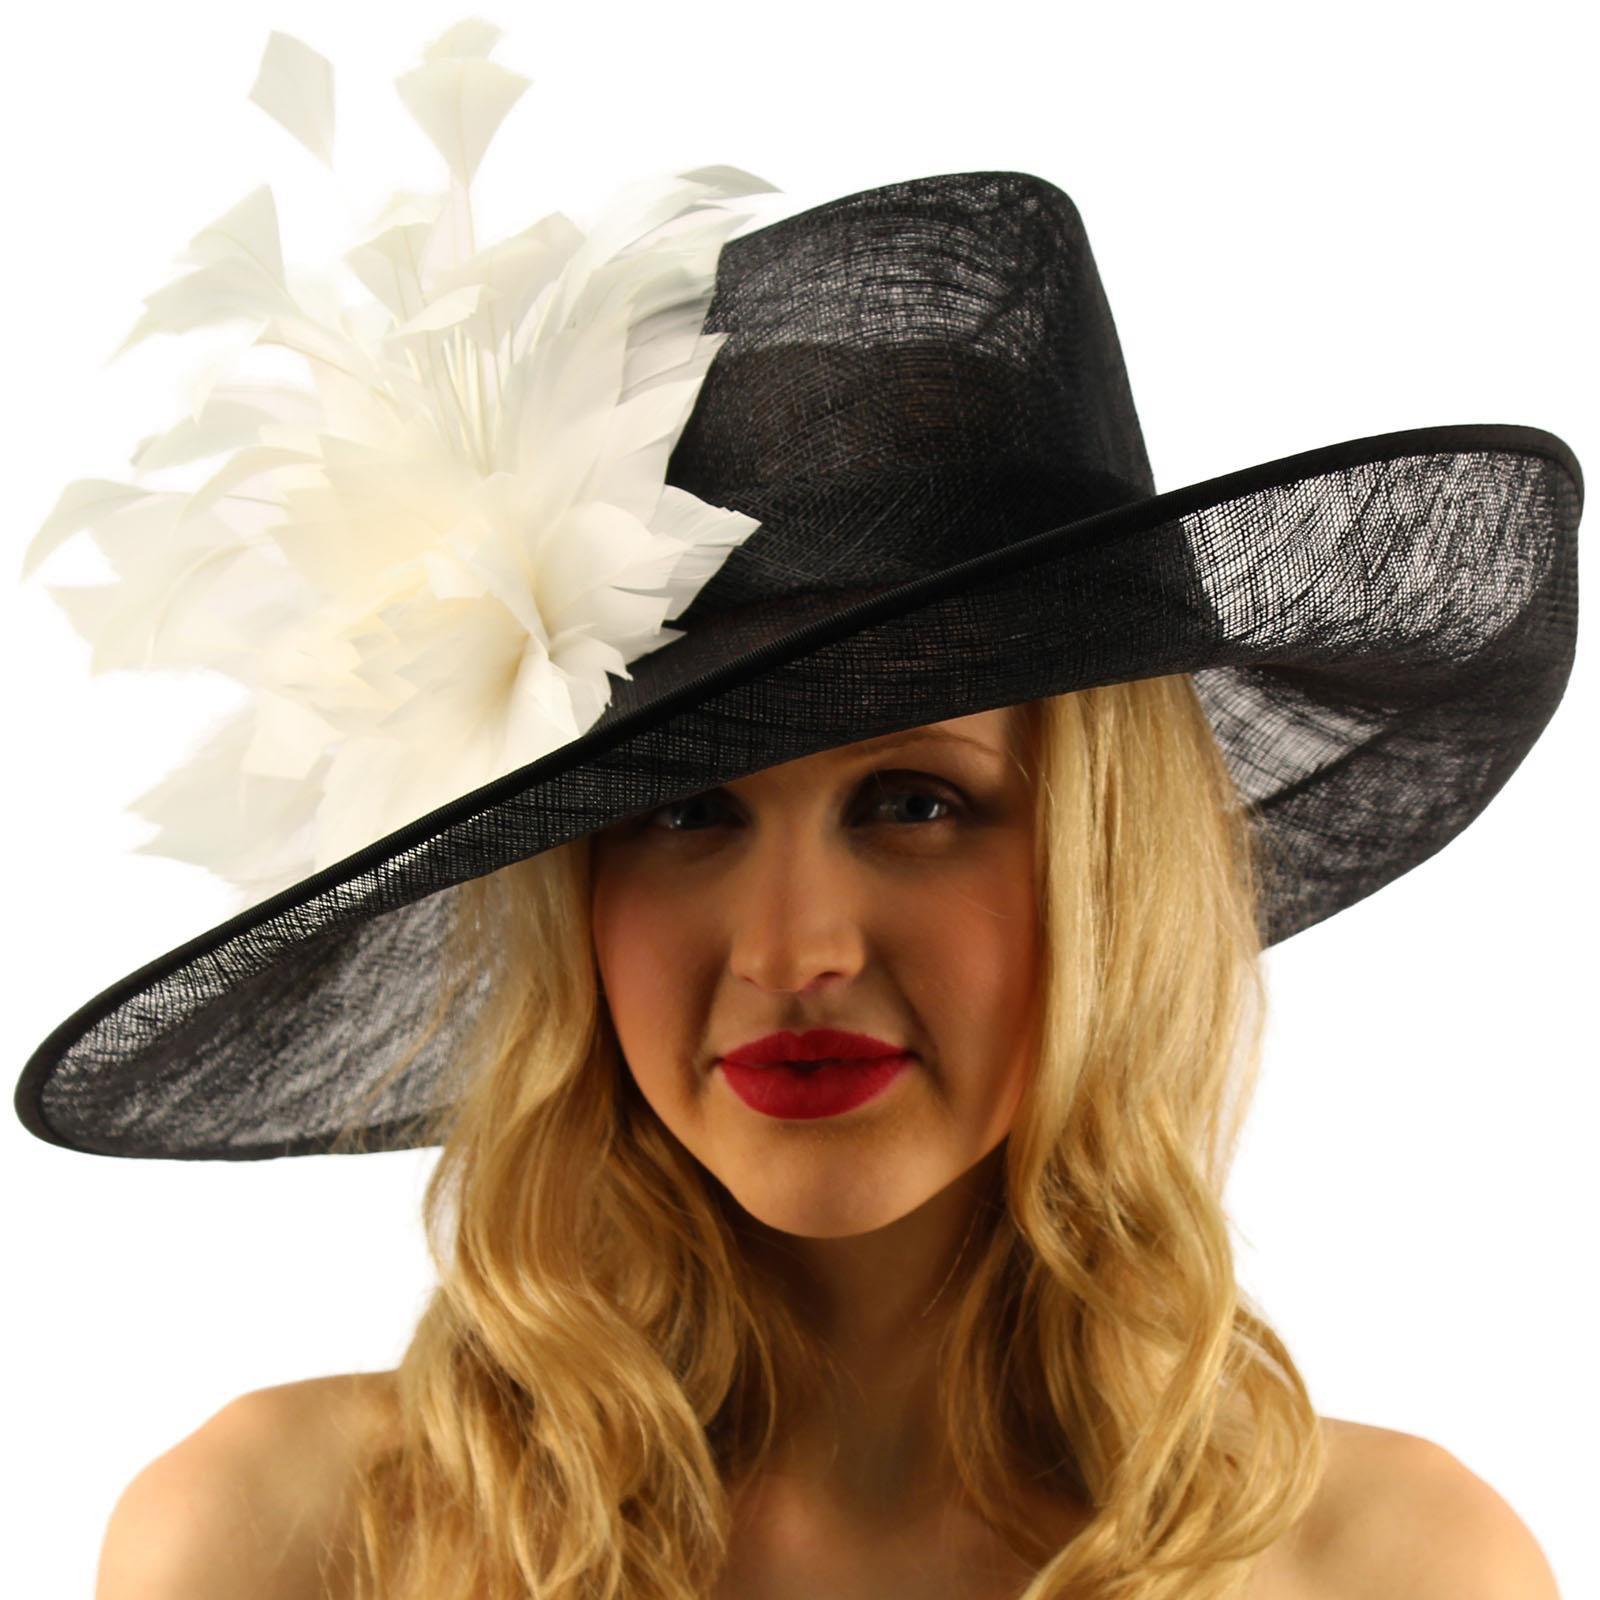 Glorious Side Flip Sinamy Floral Feathers Derby Floppy Dress Wide Brim Hat Black/White by SK Hat shop